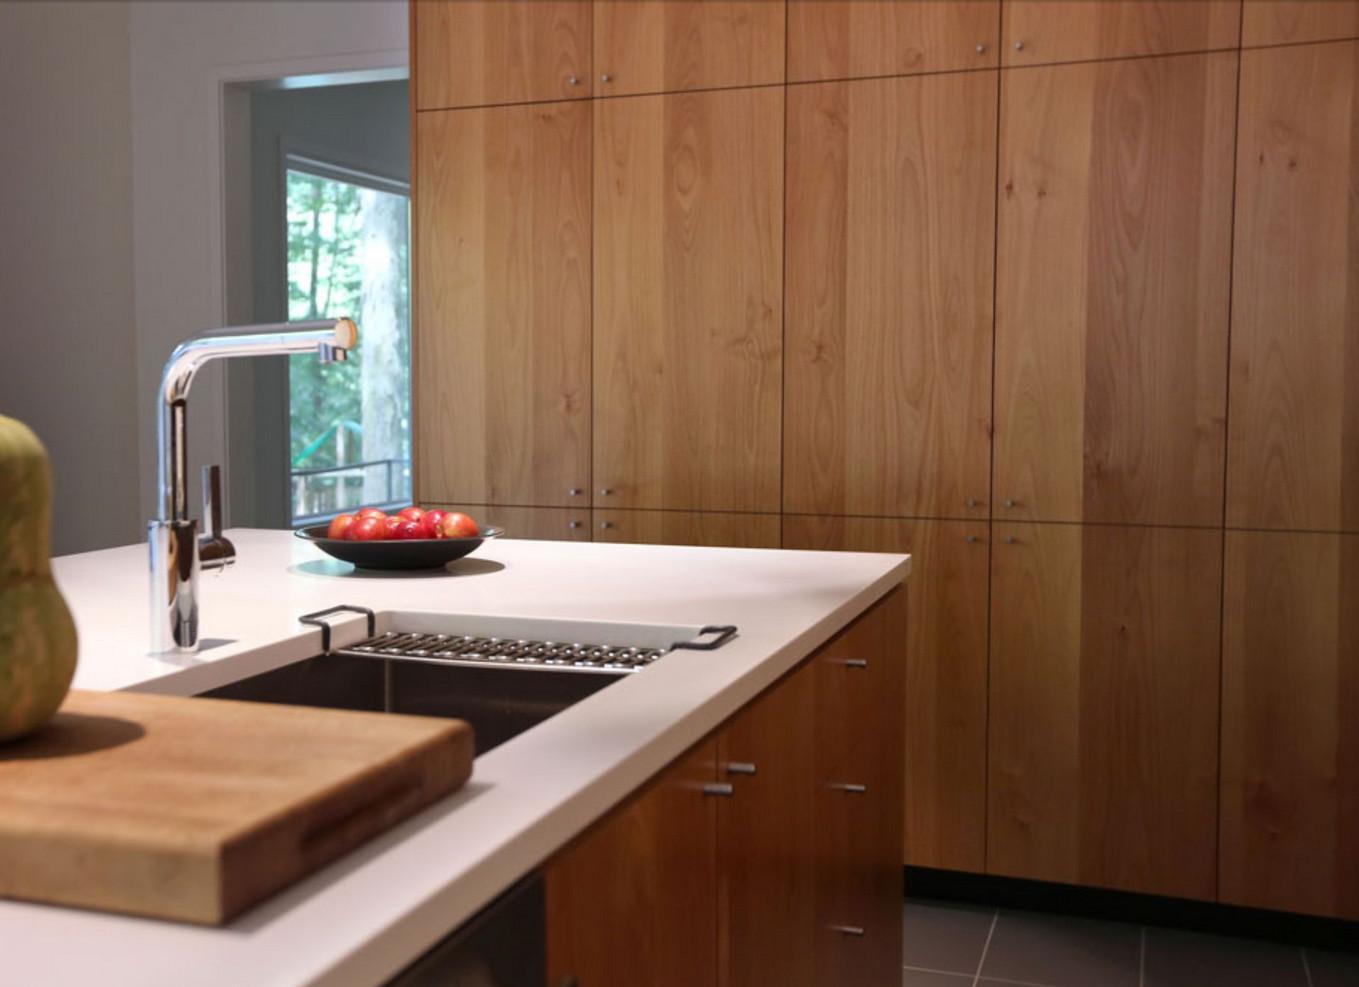 Custom Kitchen Sink and Matching Floor-to-Ceiling Alder Veneer Cabinets